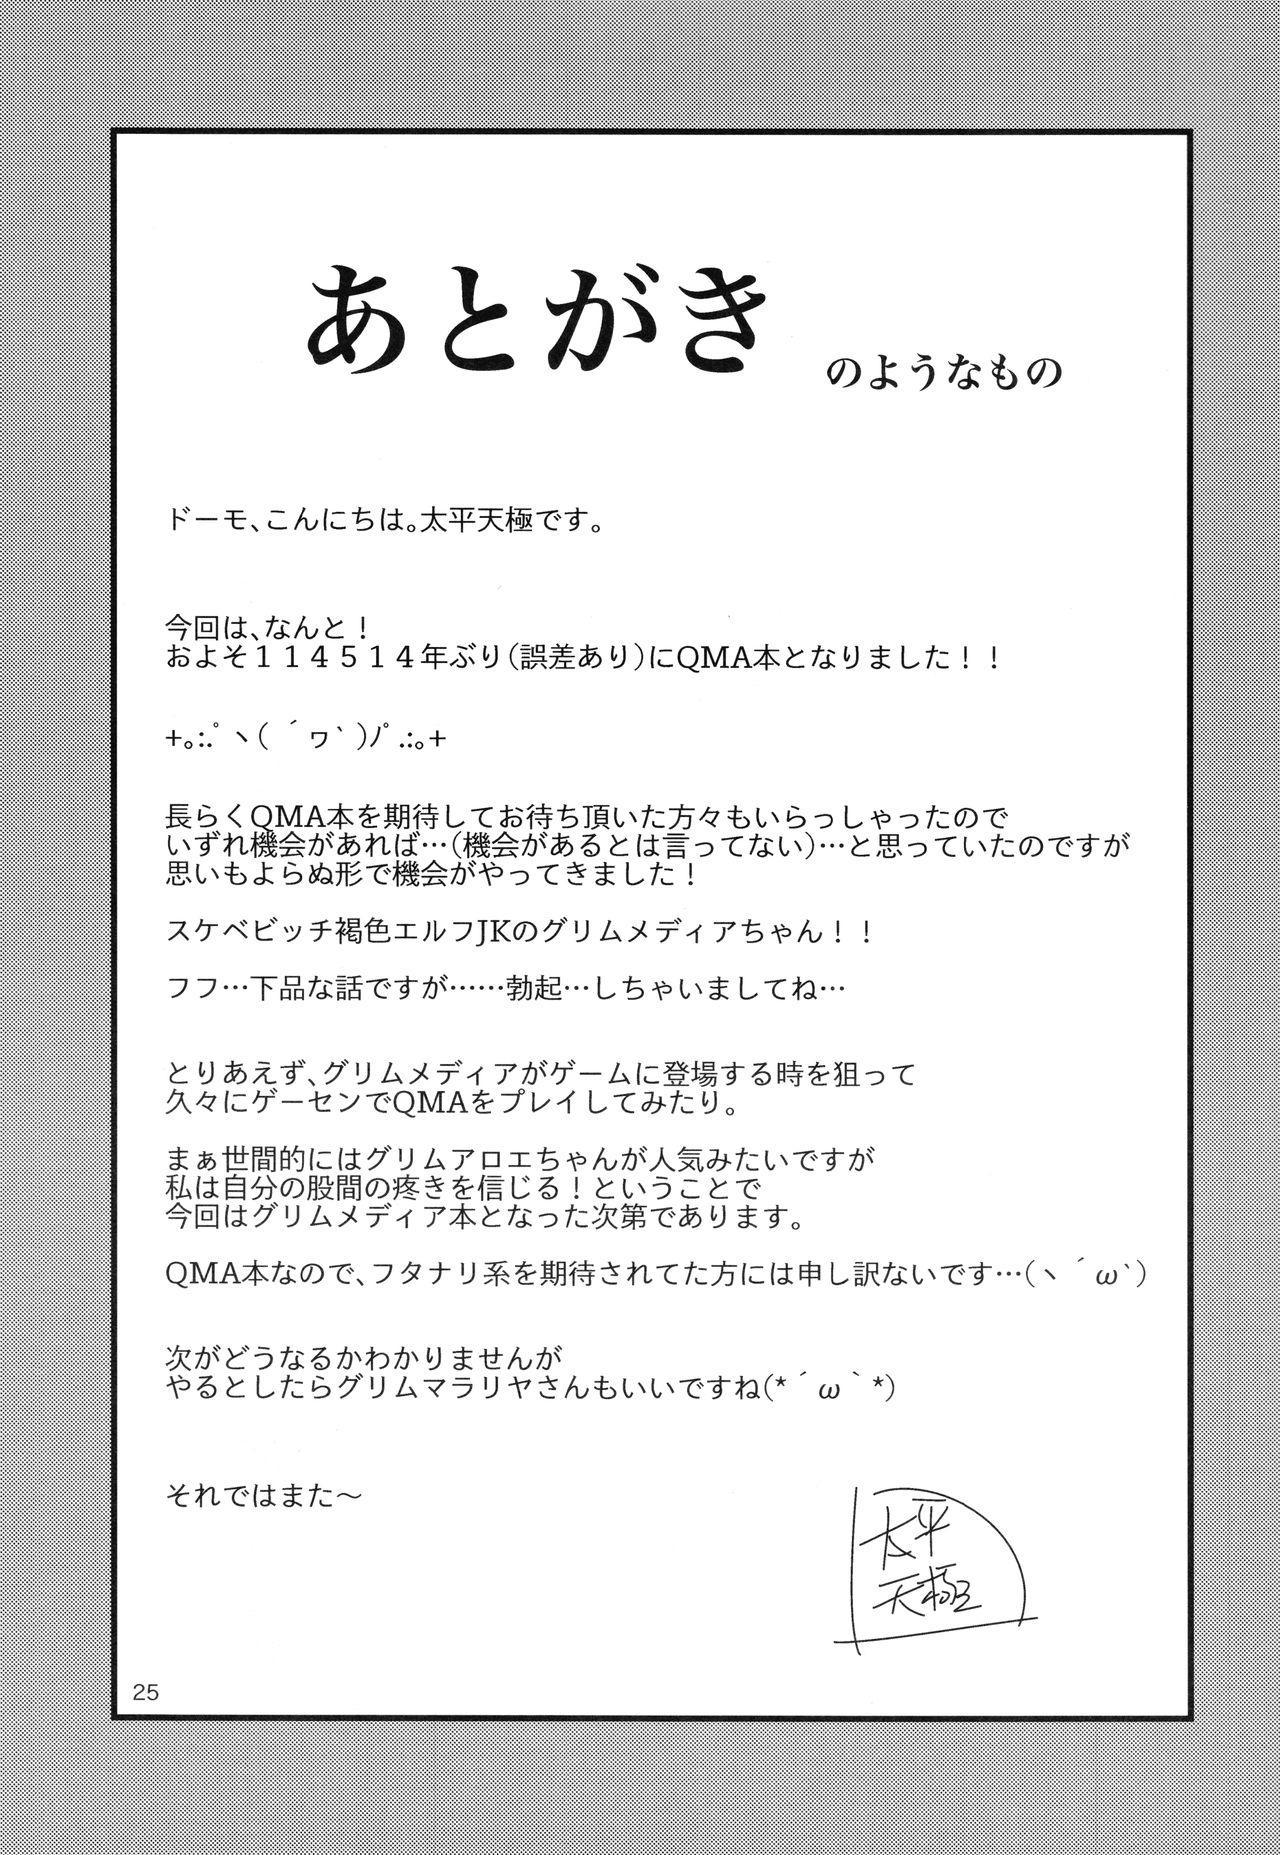 Isekai Bitch ga Tokyo ni Yattekita. 23